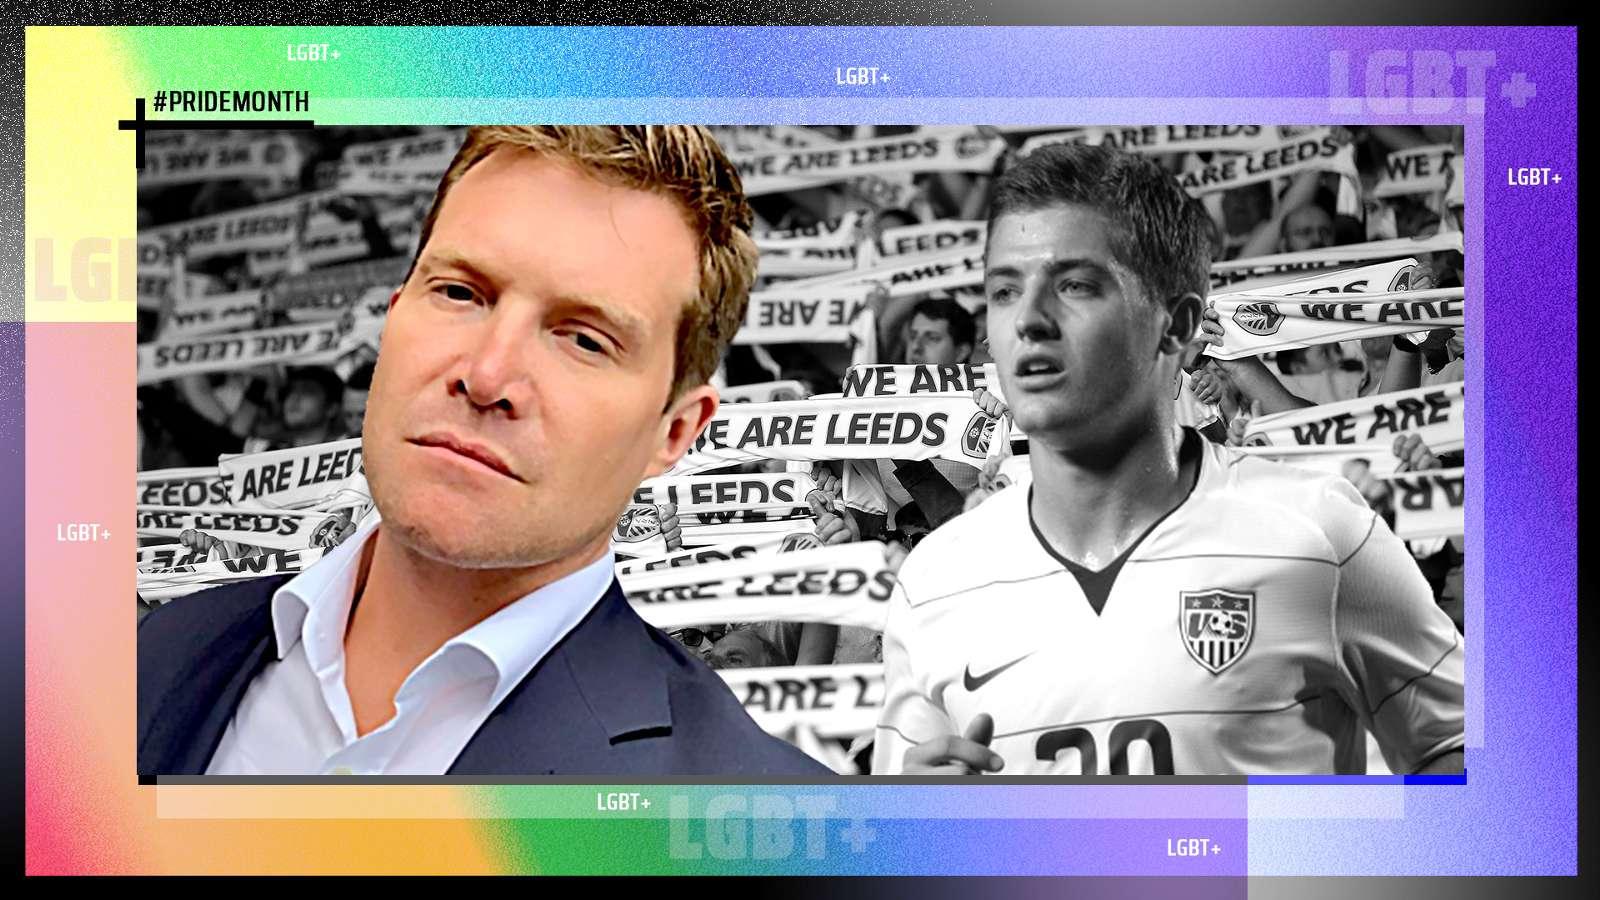 David Haigh Robbie Rogers Leeds United LGBT+ PRIDE GFX